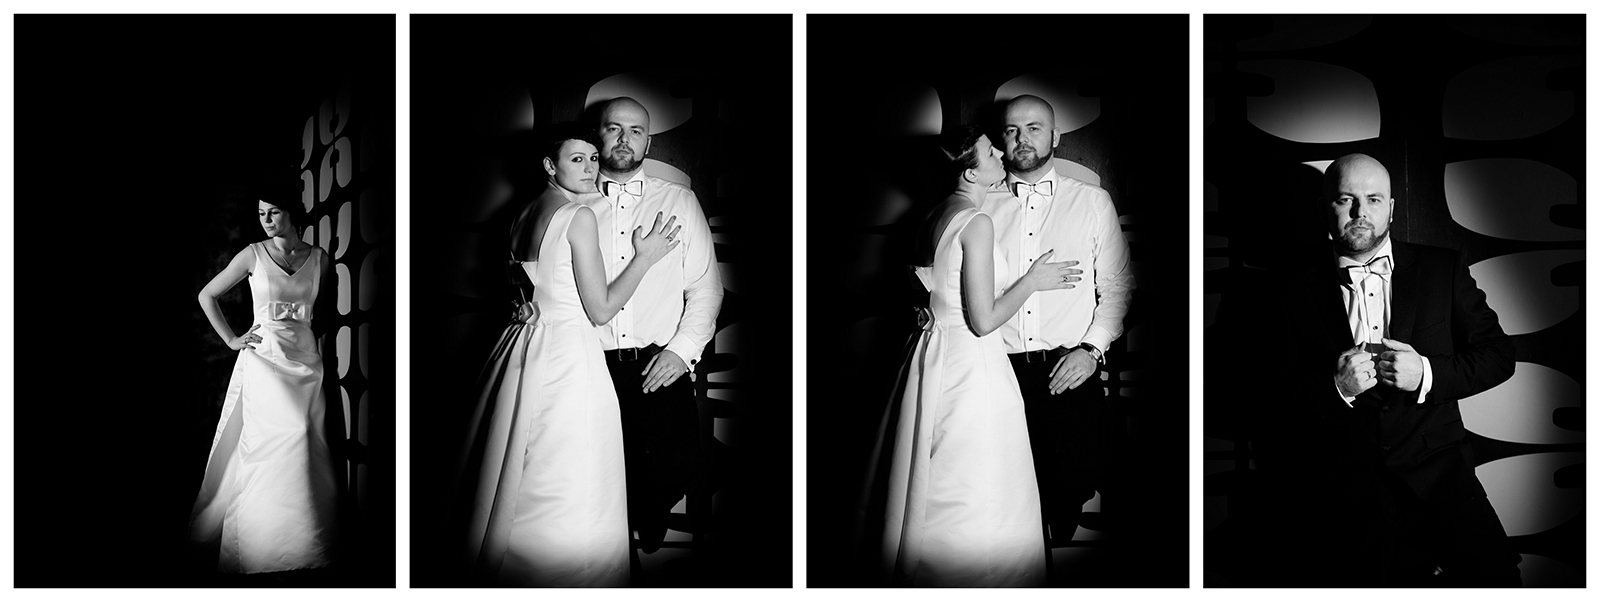 IMAGE: http://mkstudio.smugmug.com/Weddings/Klaudia-i-Przemek/i-tPKwG8n/0/XL/124-XL.jpg